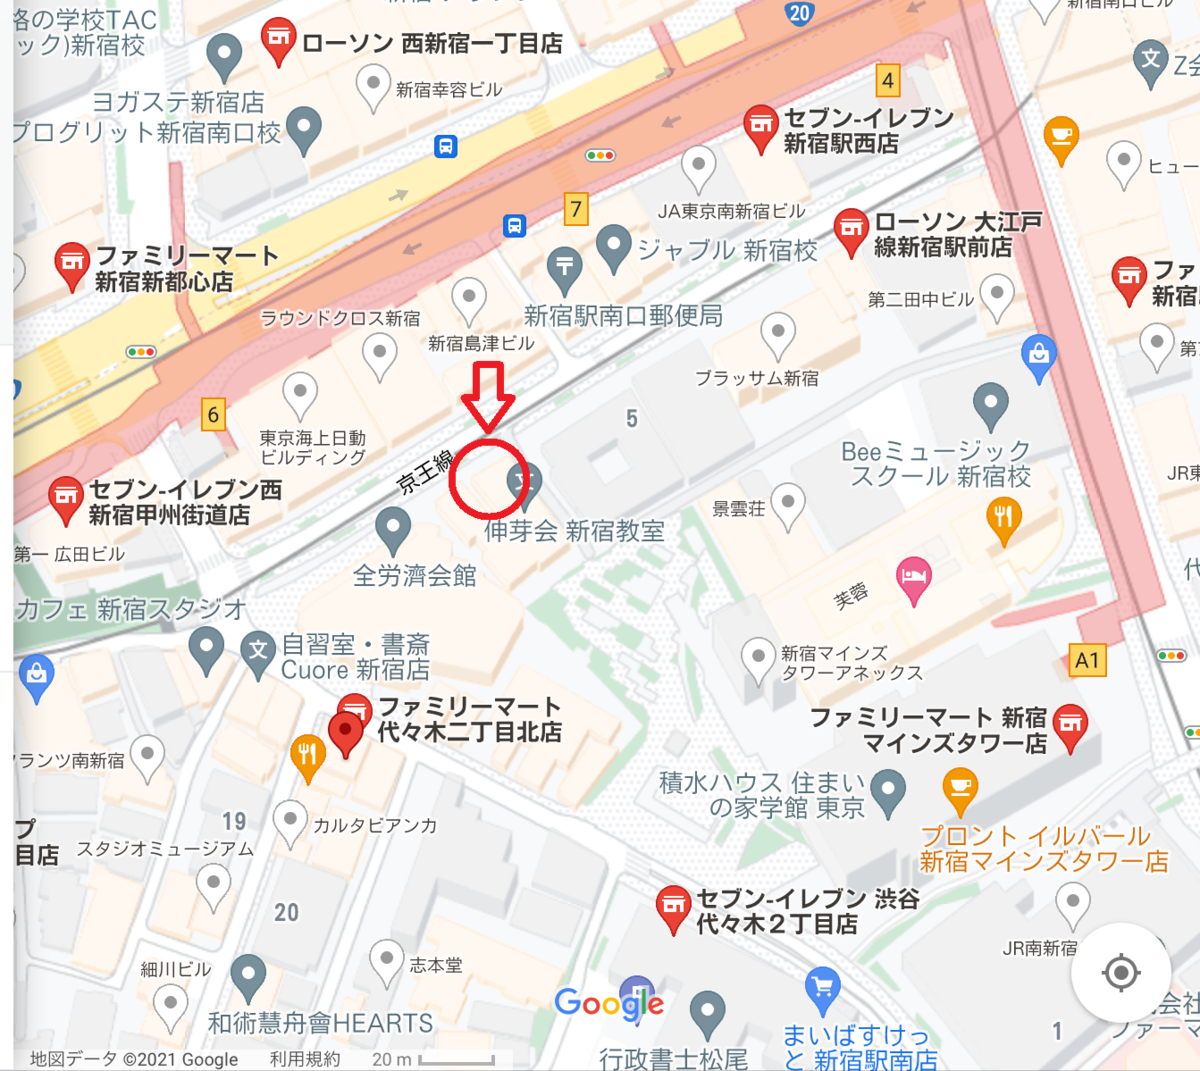 f:id:nicotakuya:20210923072256p:plain